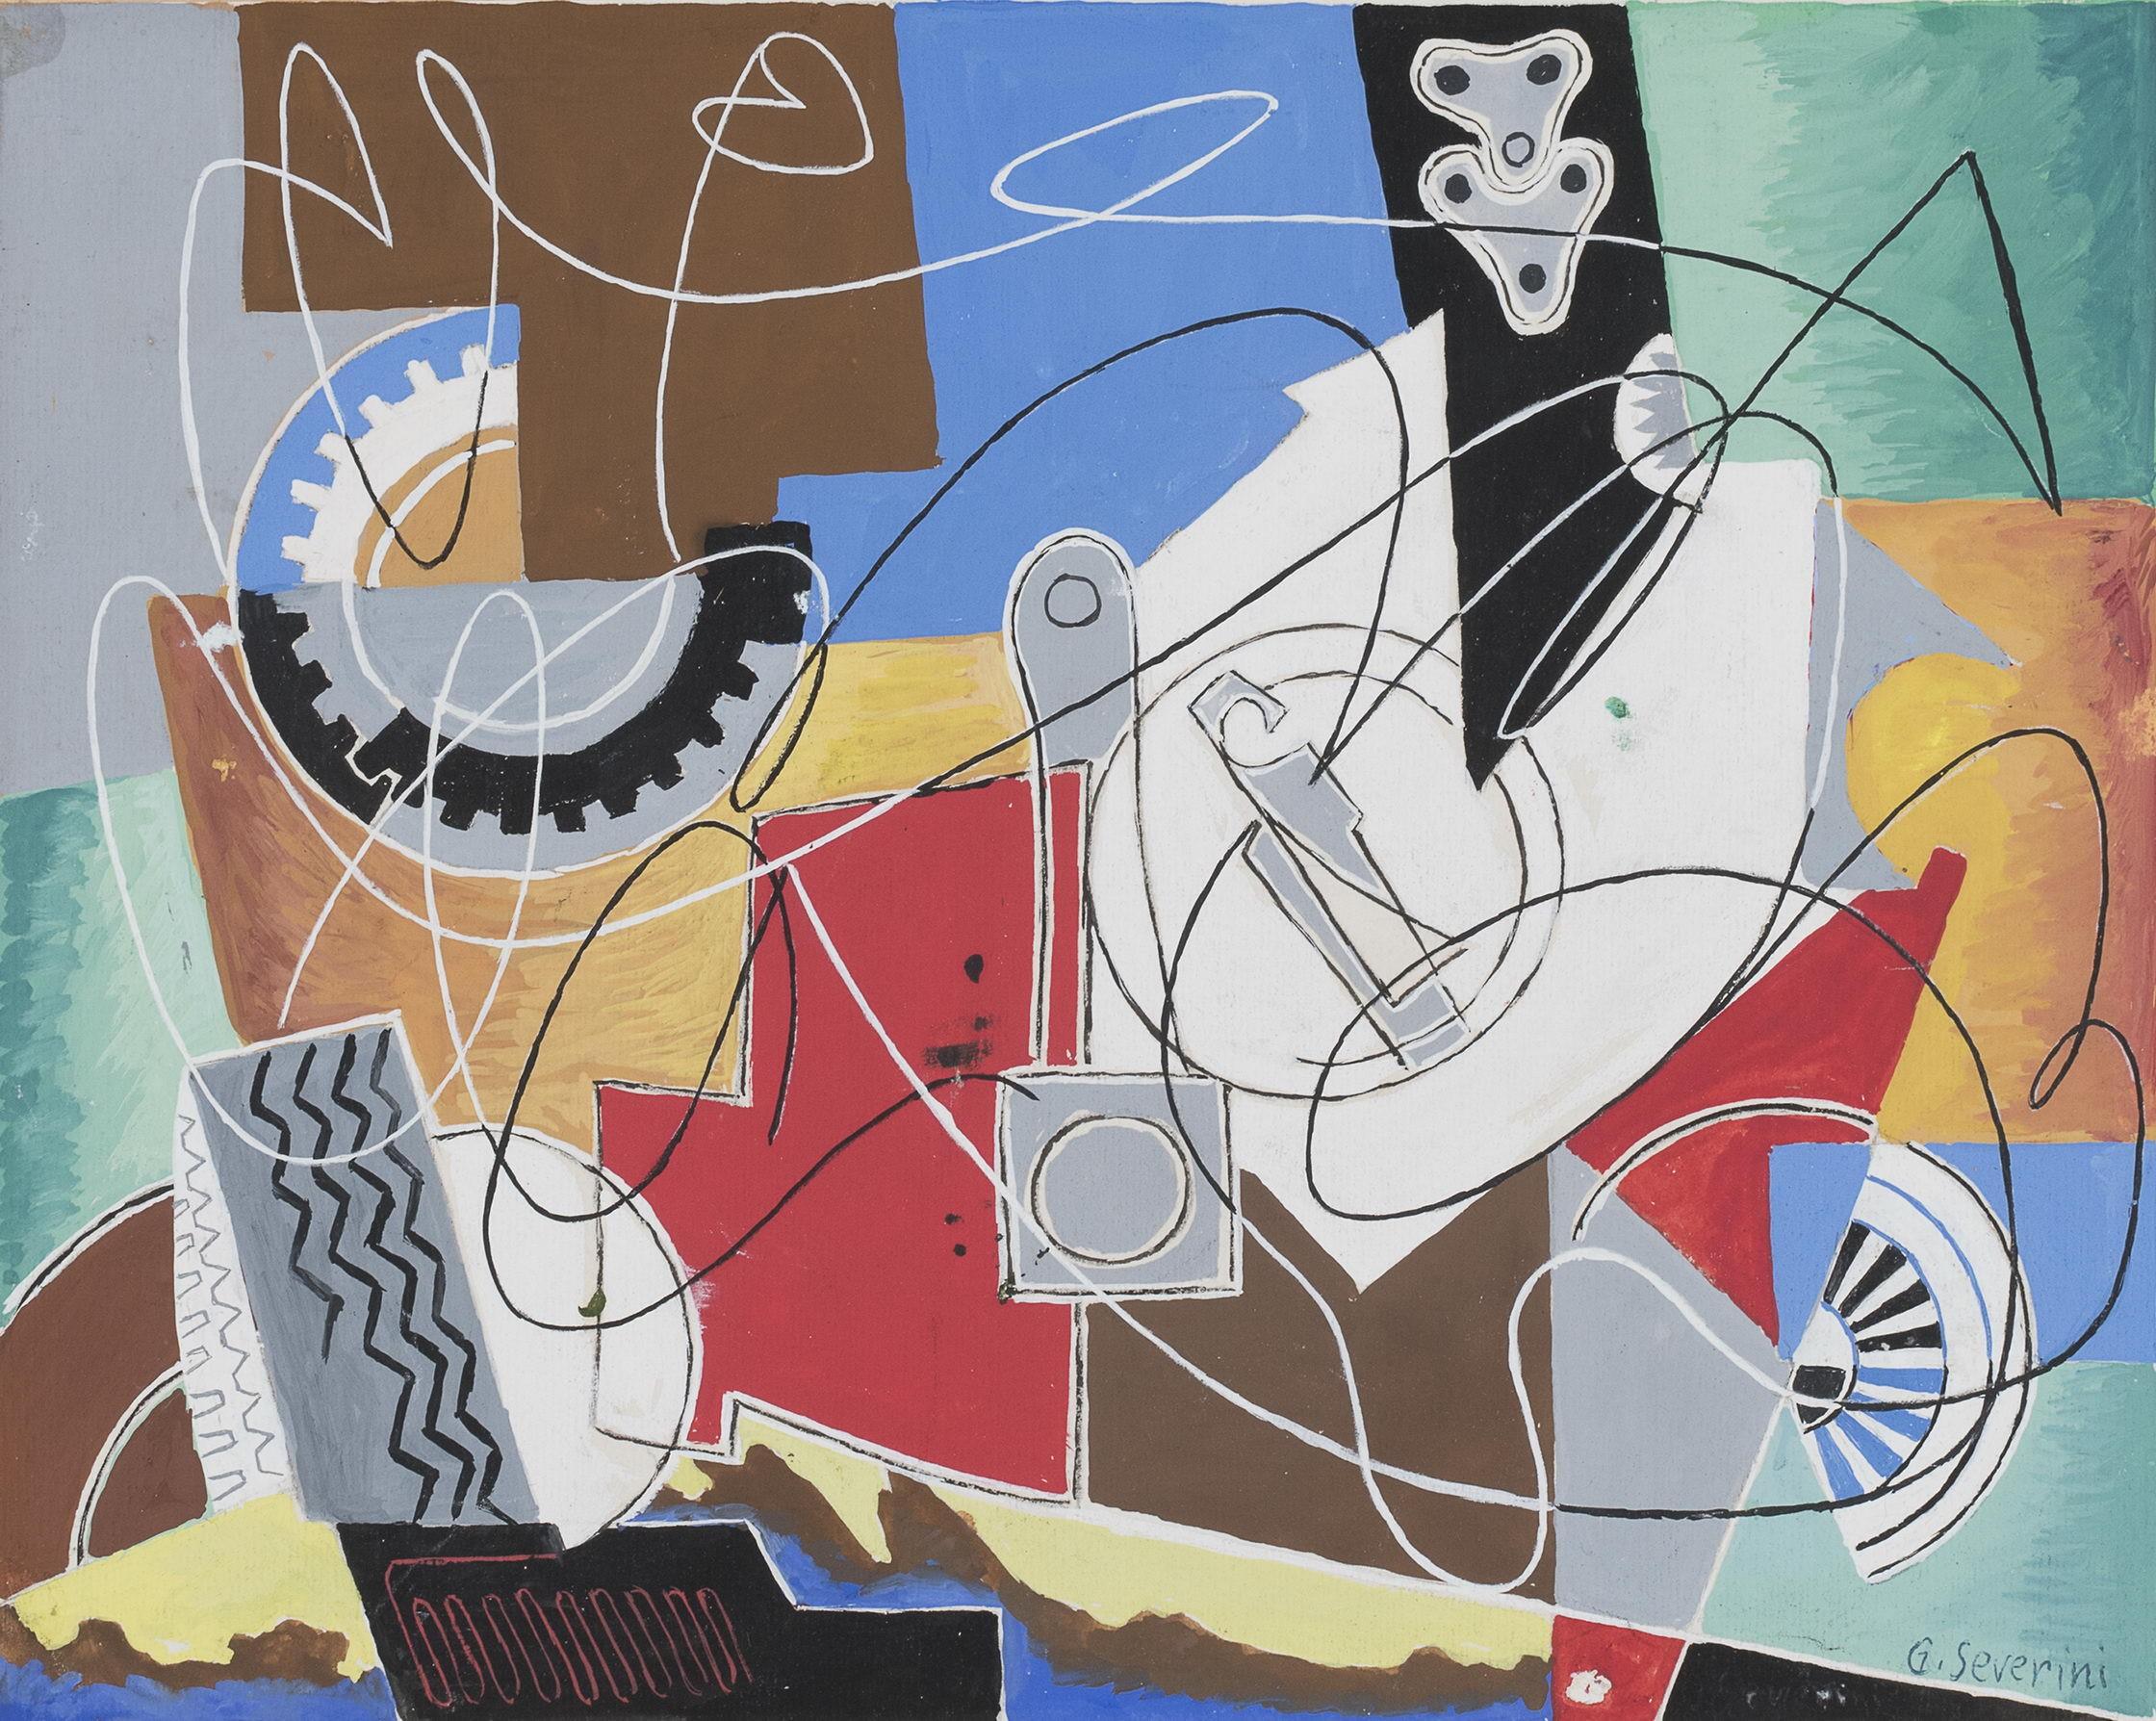 Le aste della settimana e i link ai Cataloghi. Arte moderna e contemporanea da Babuino, Meeting Art e Finarte